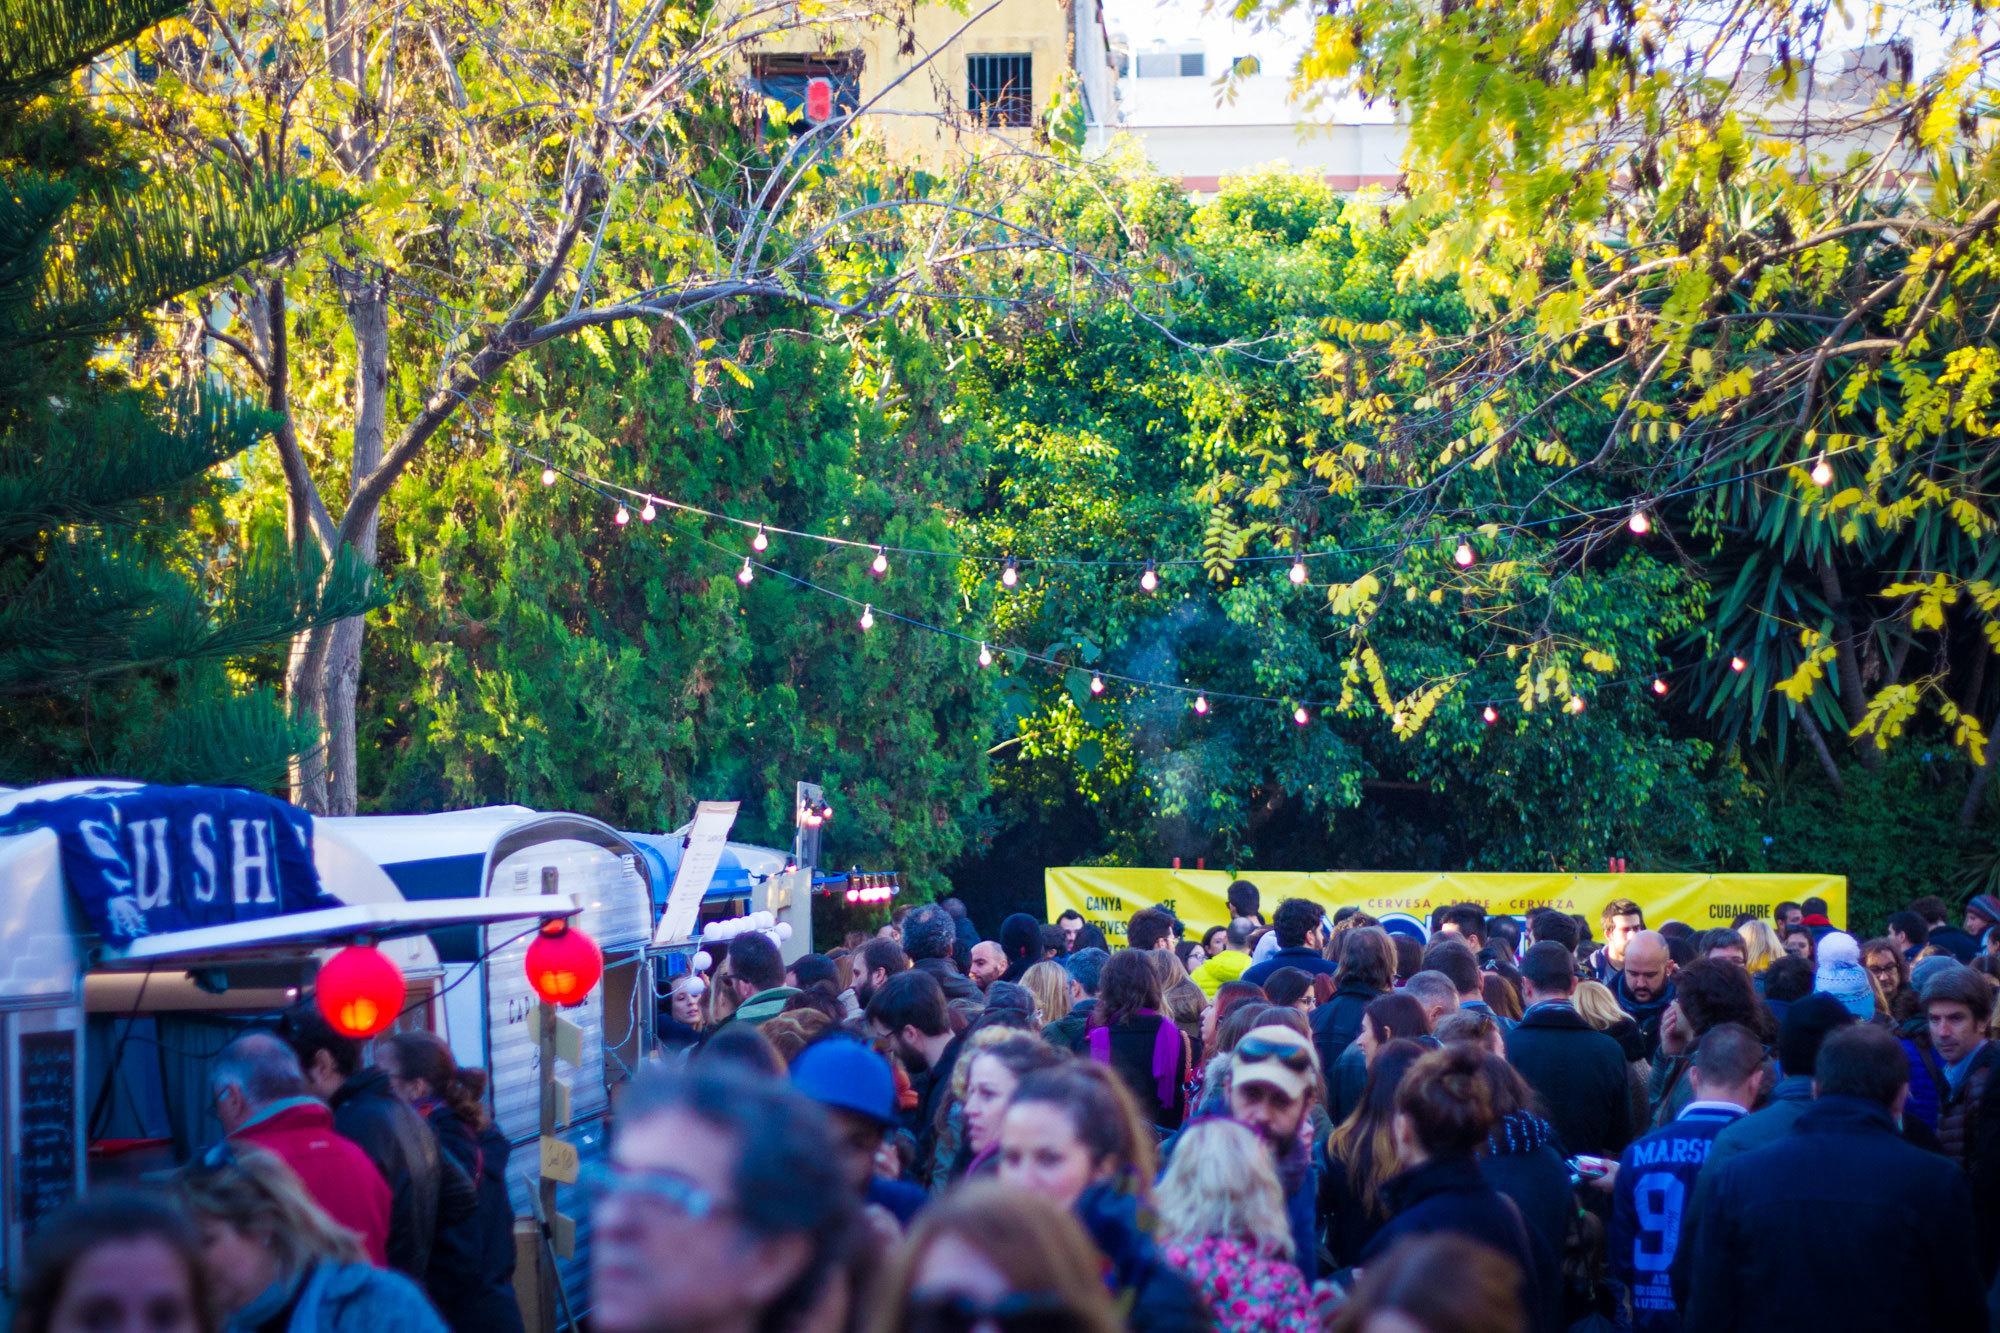 Palo Alto Market: On the road